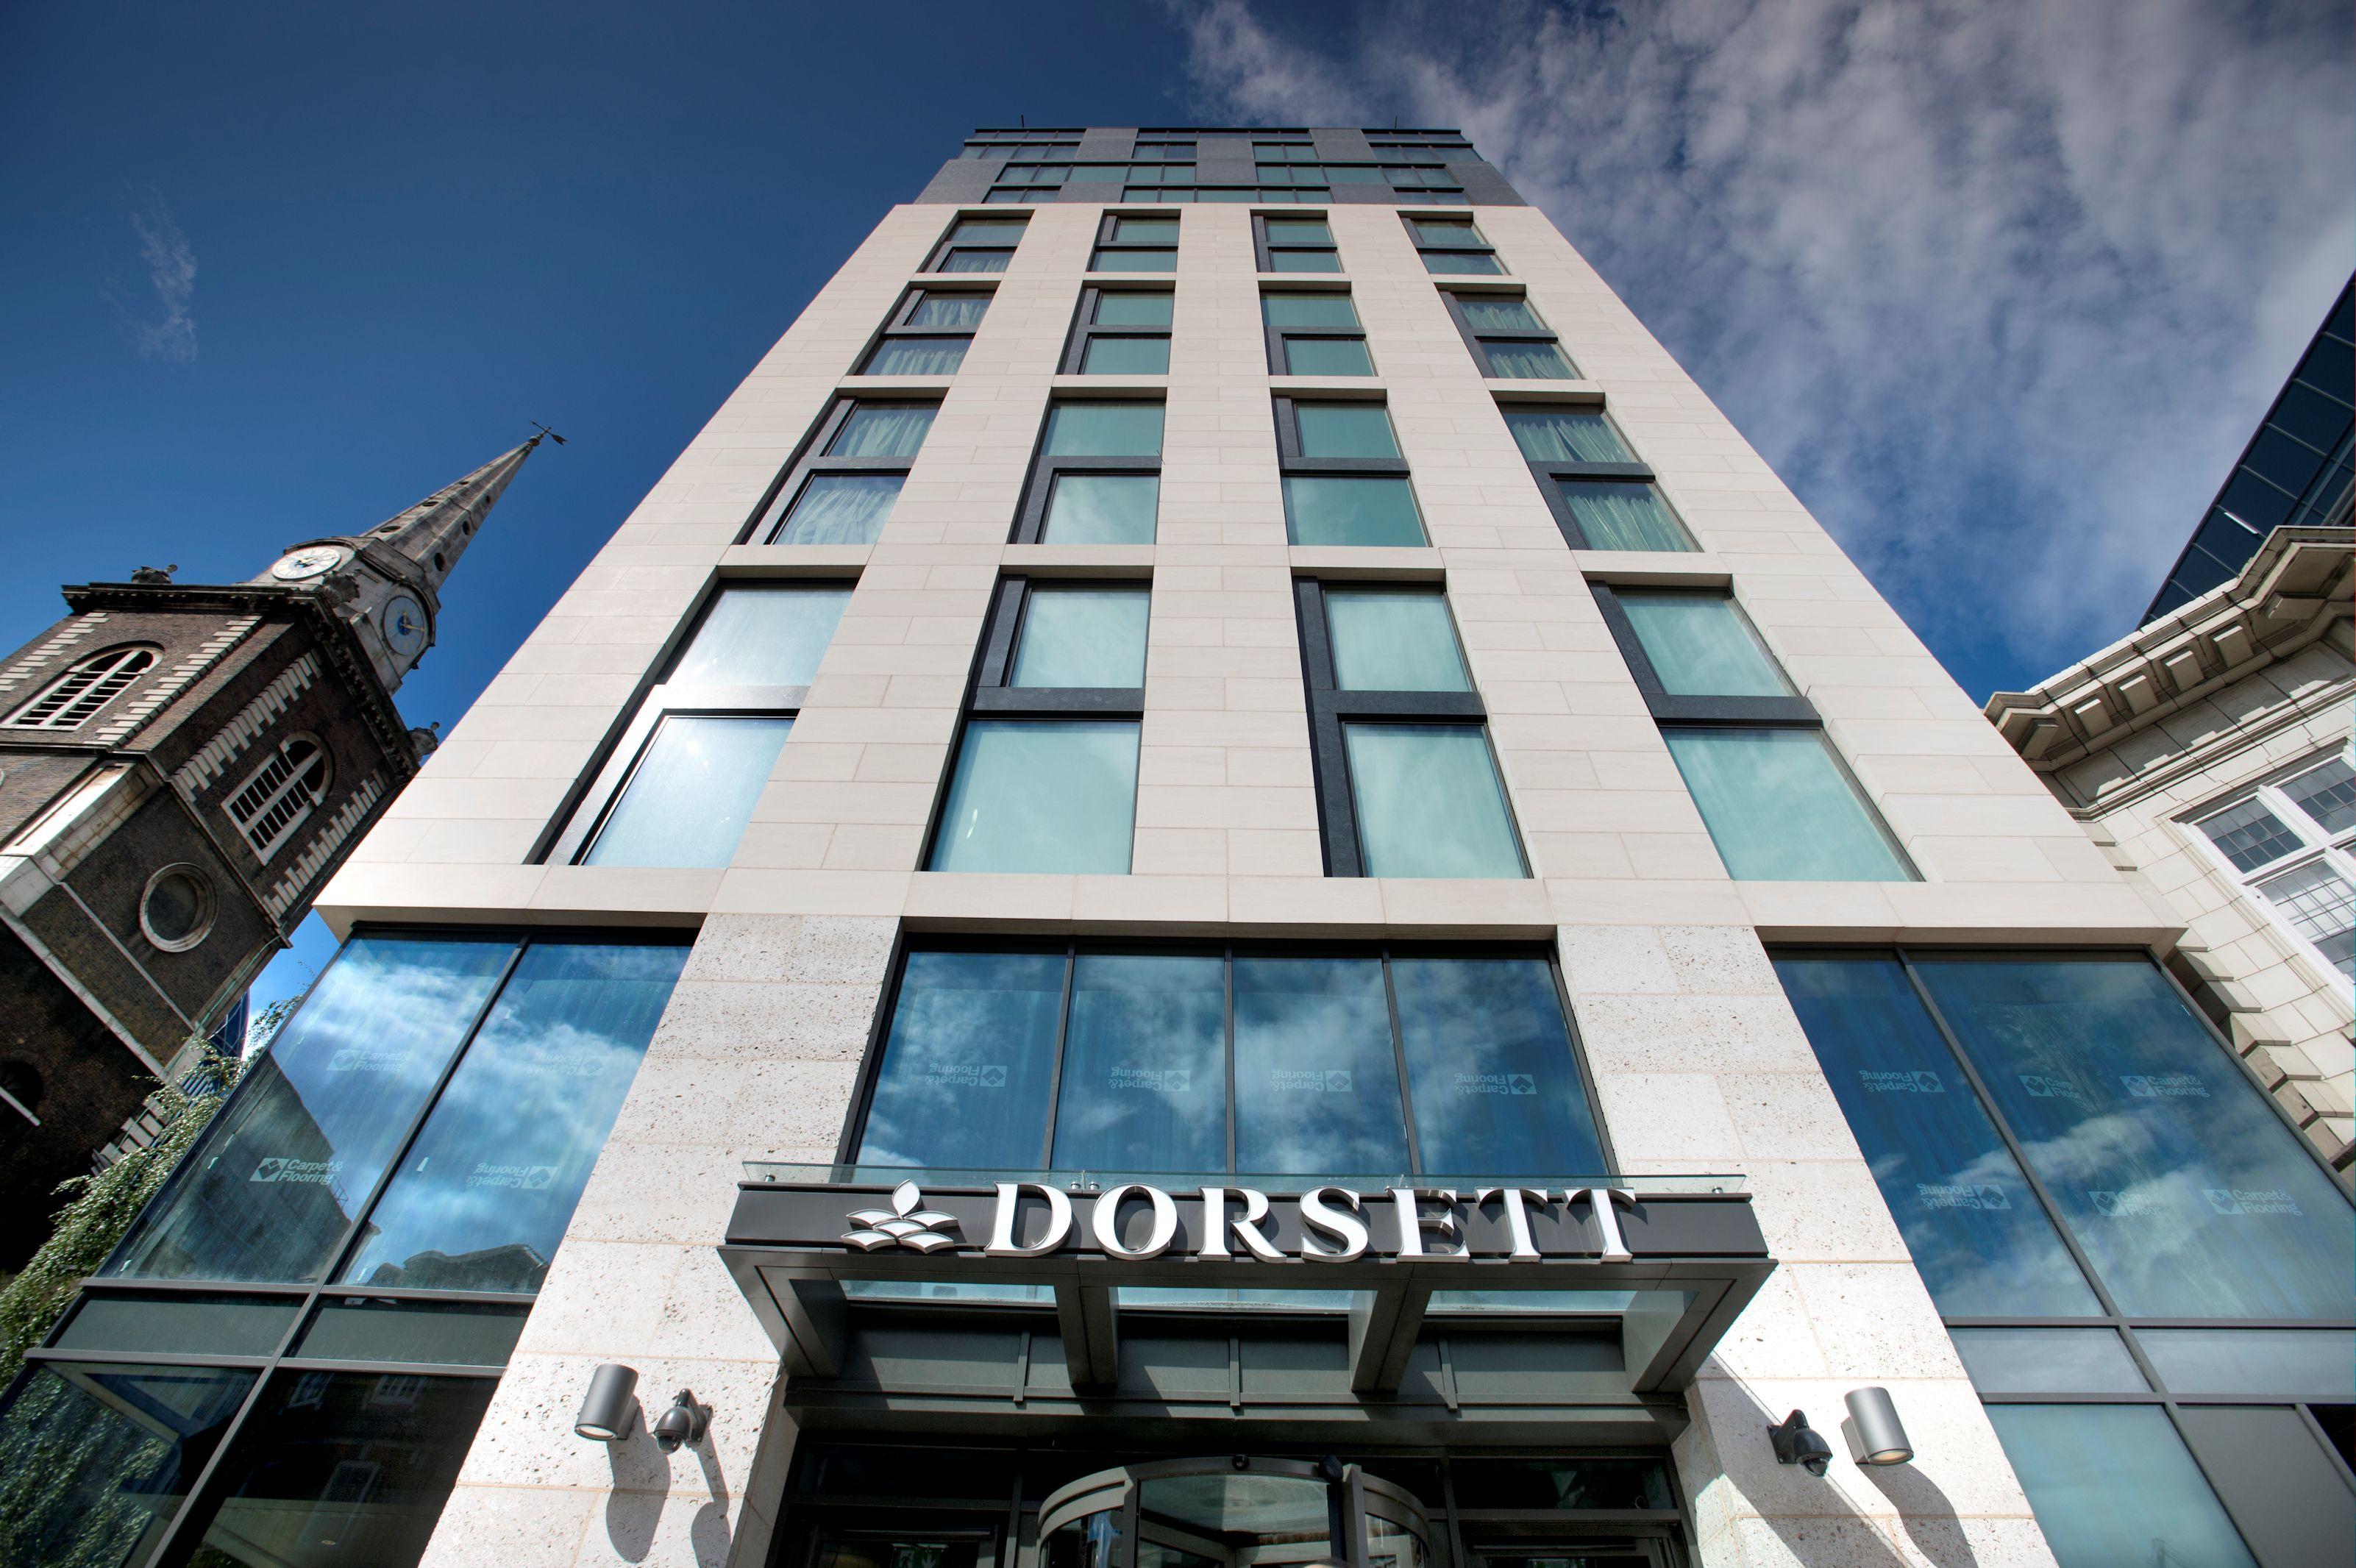 Dorsett Hotel completion - midjpg